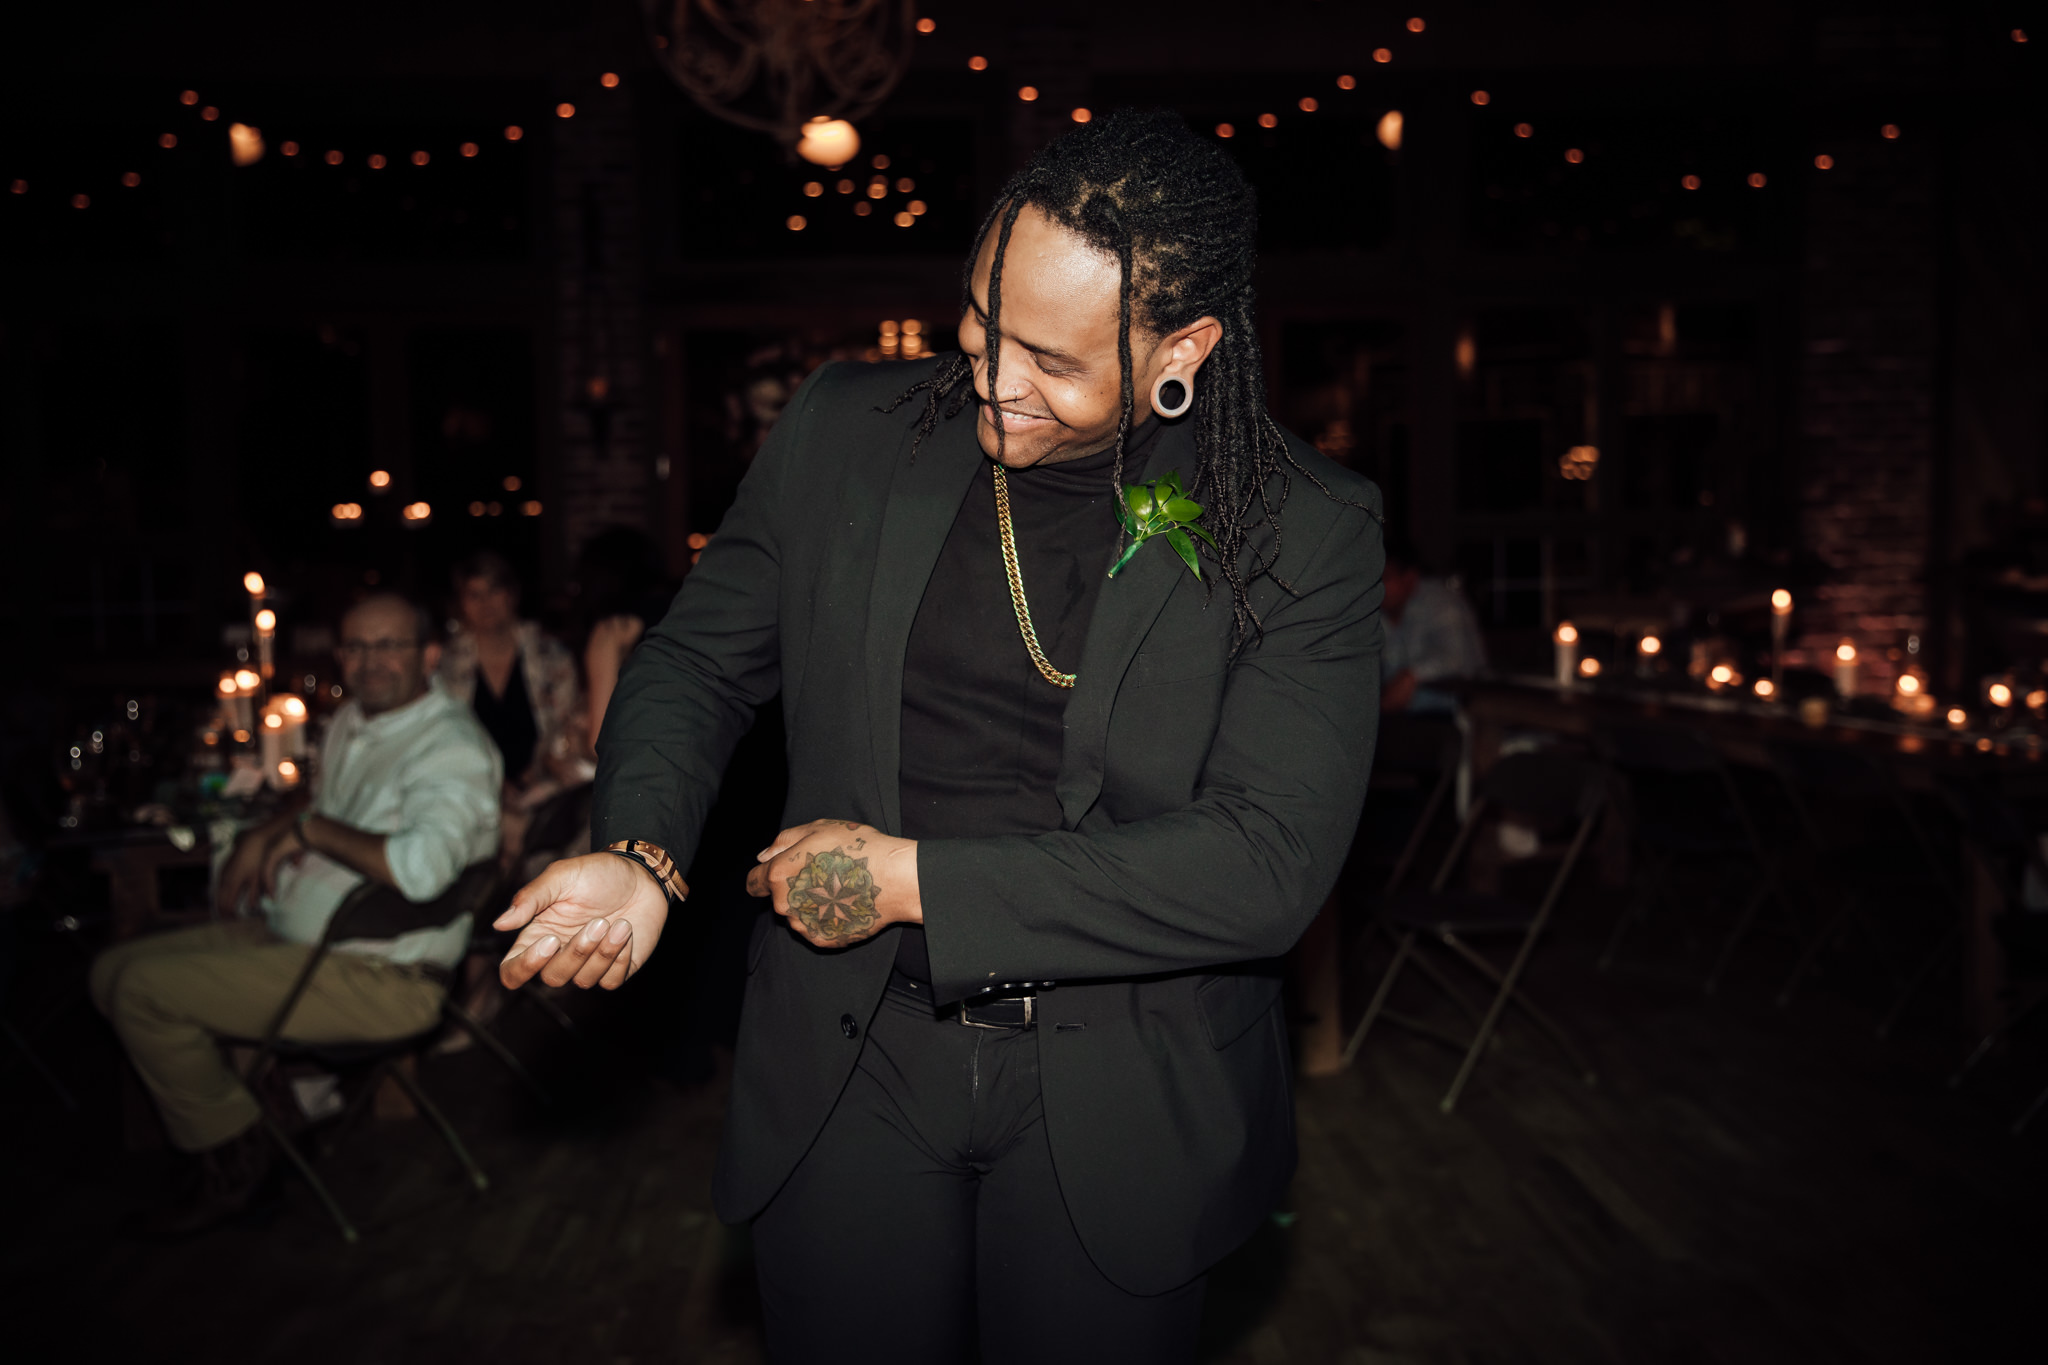 phantom-canyon-brewery-colorado-springs-wedding-photographer-463.jpg